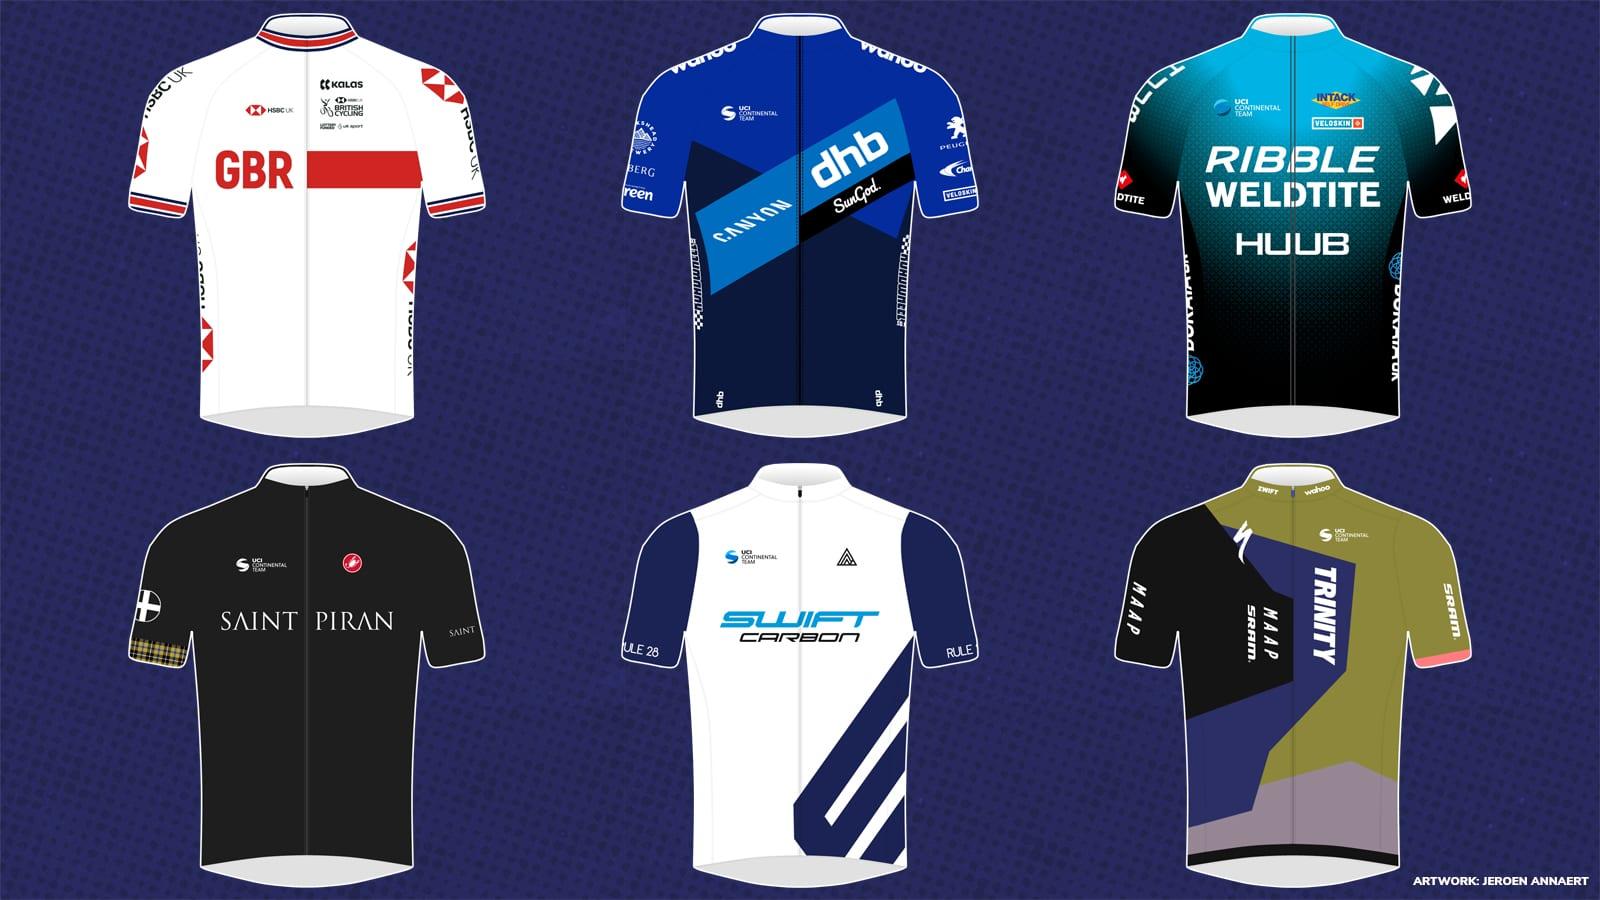 Tour of Britain teams